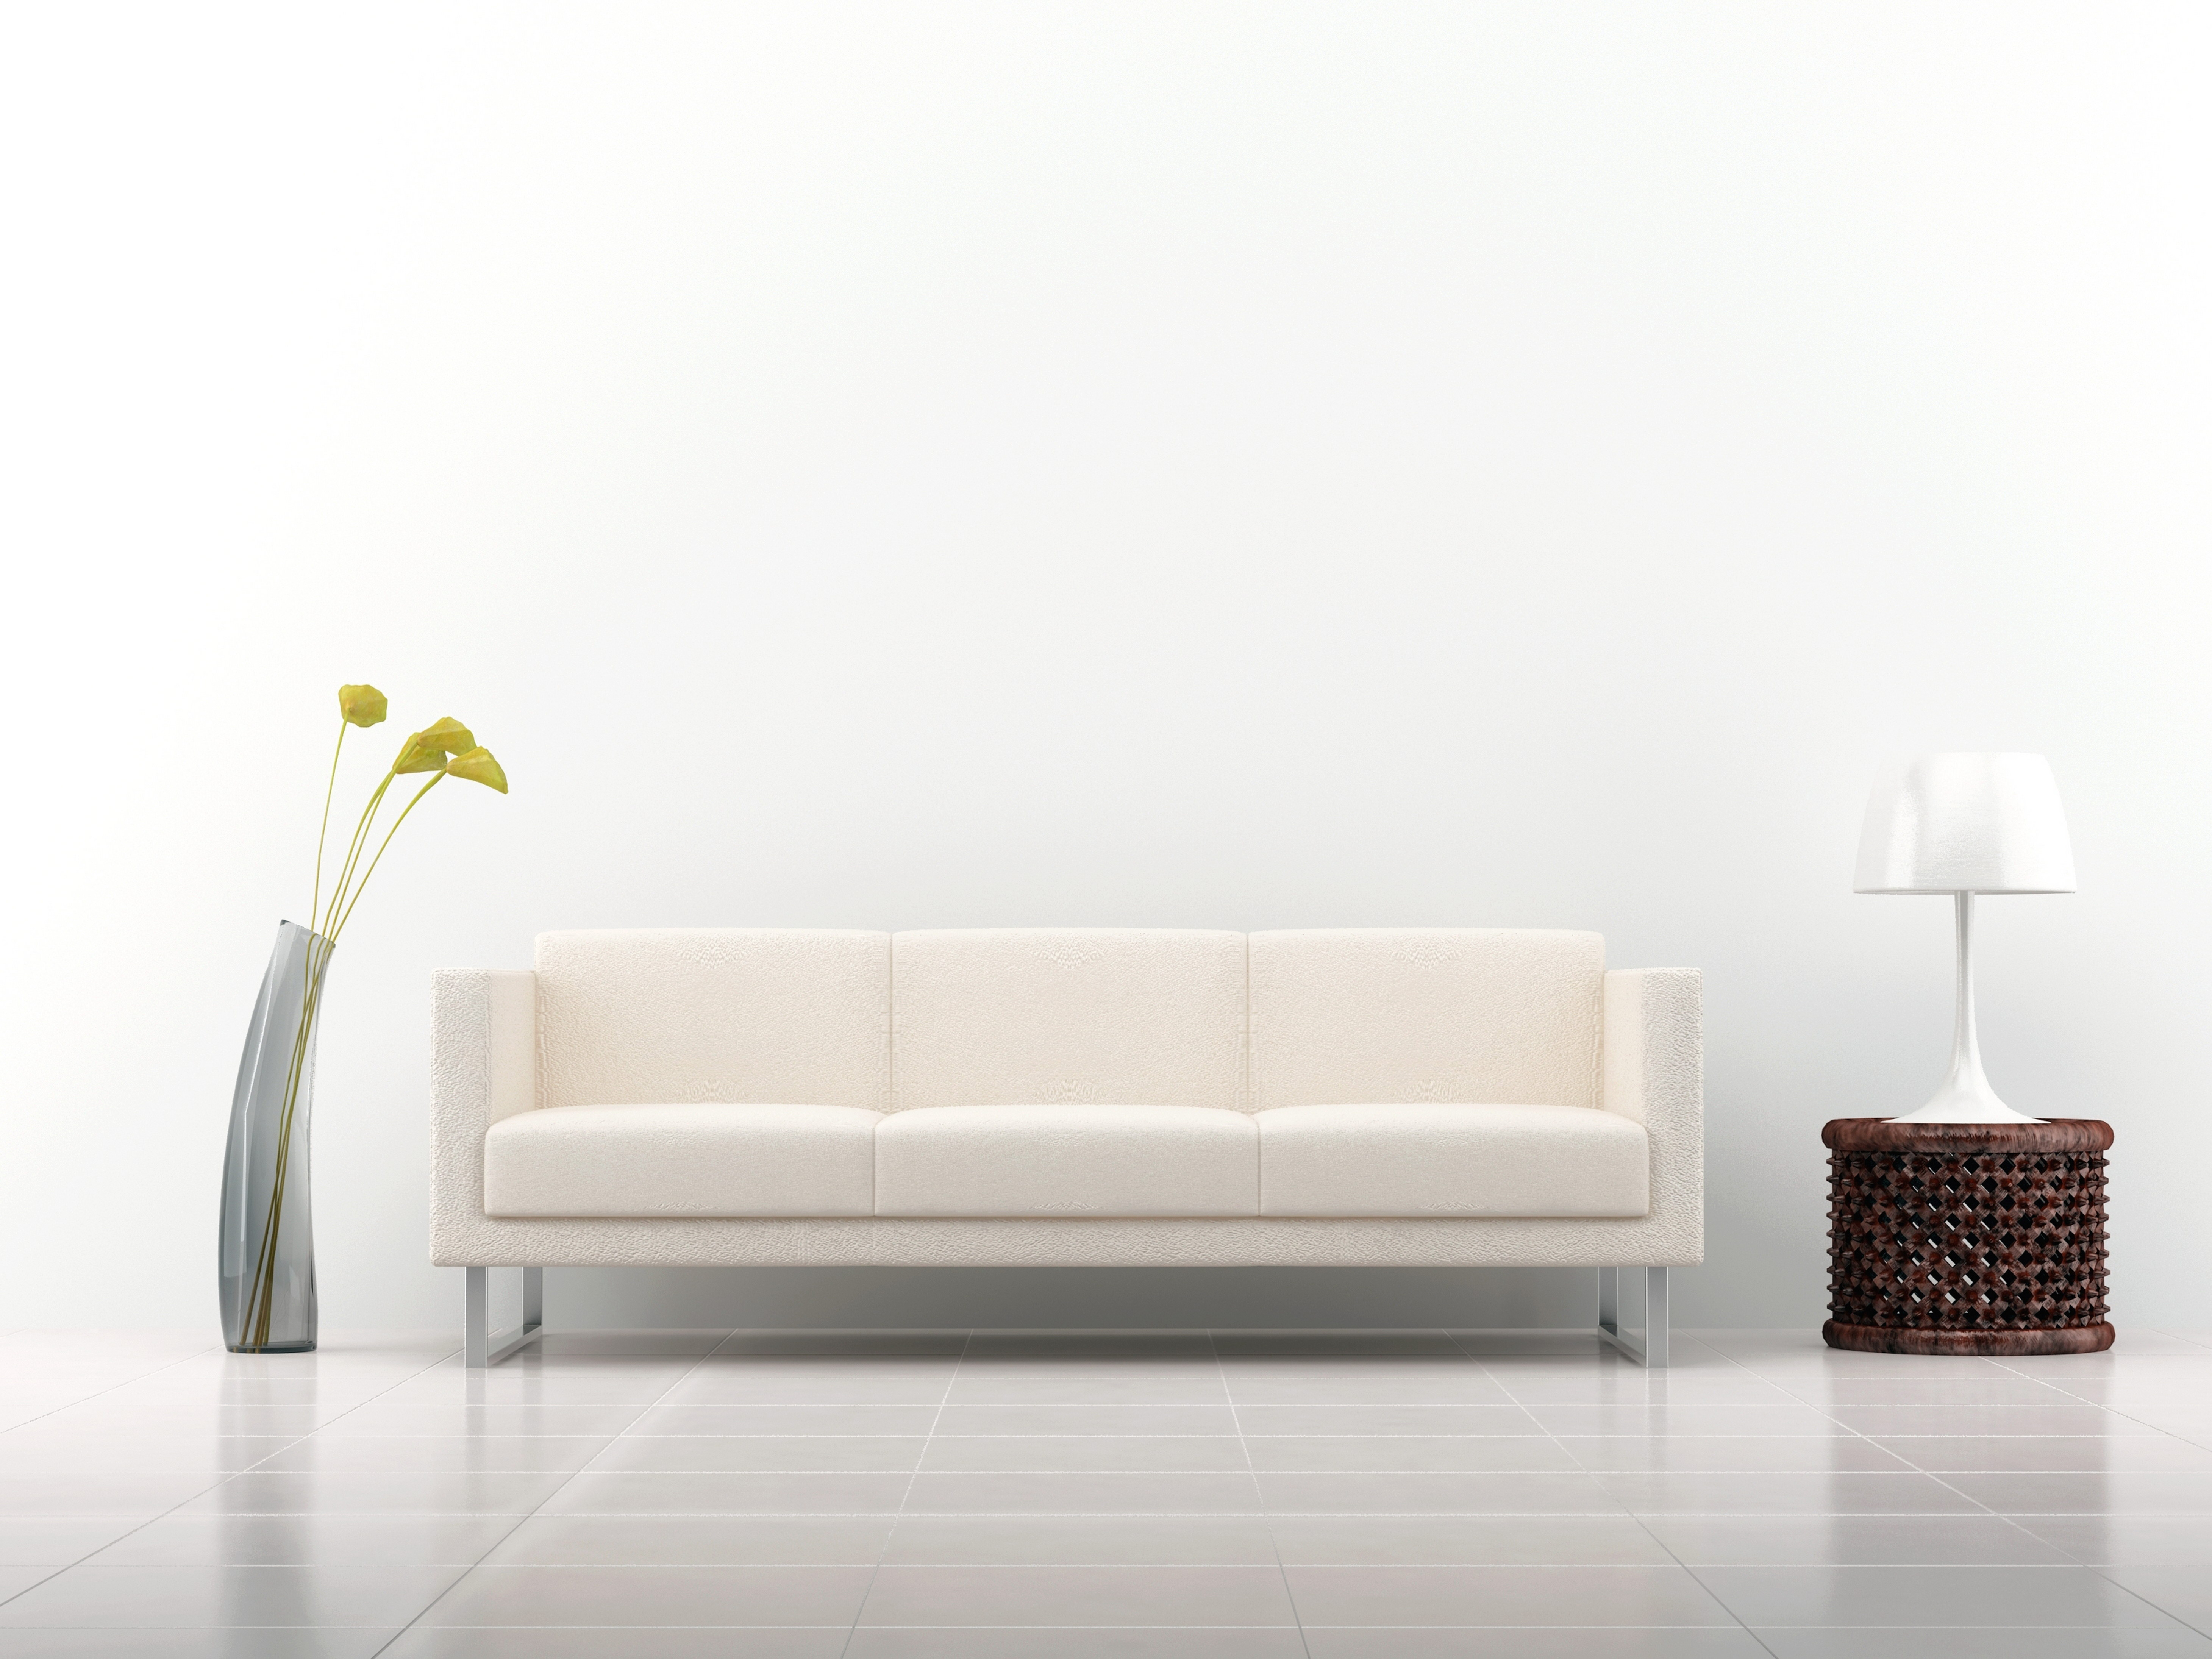 Sofa Decoration Interior Vase Lamp White Background White